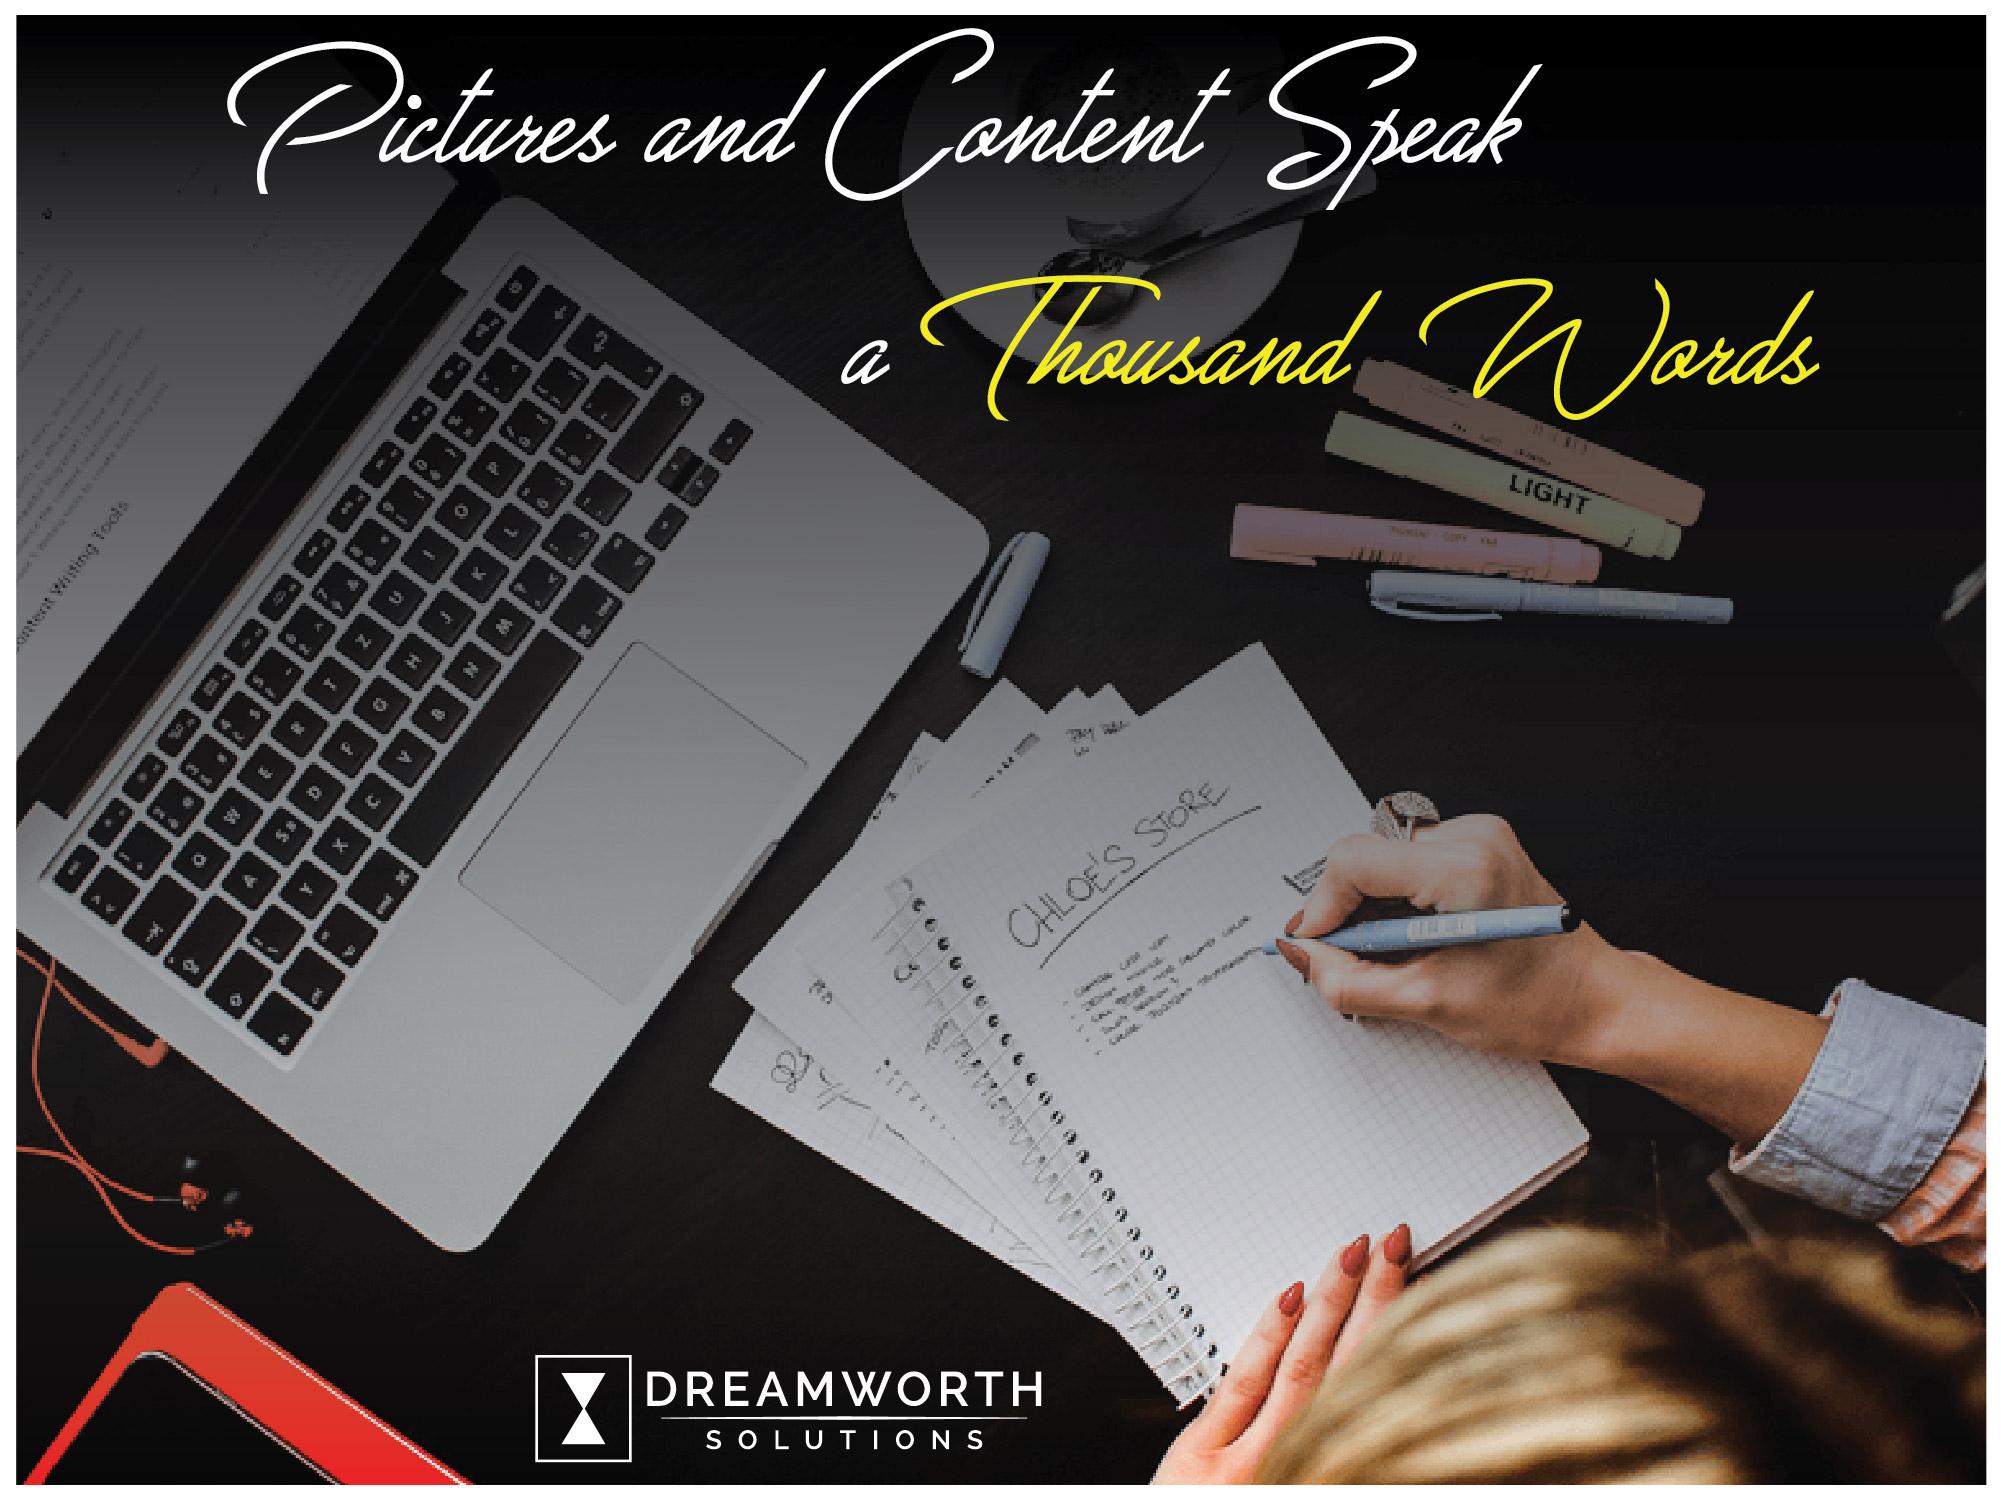 Dreamworth provide best internet marketing services